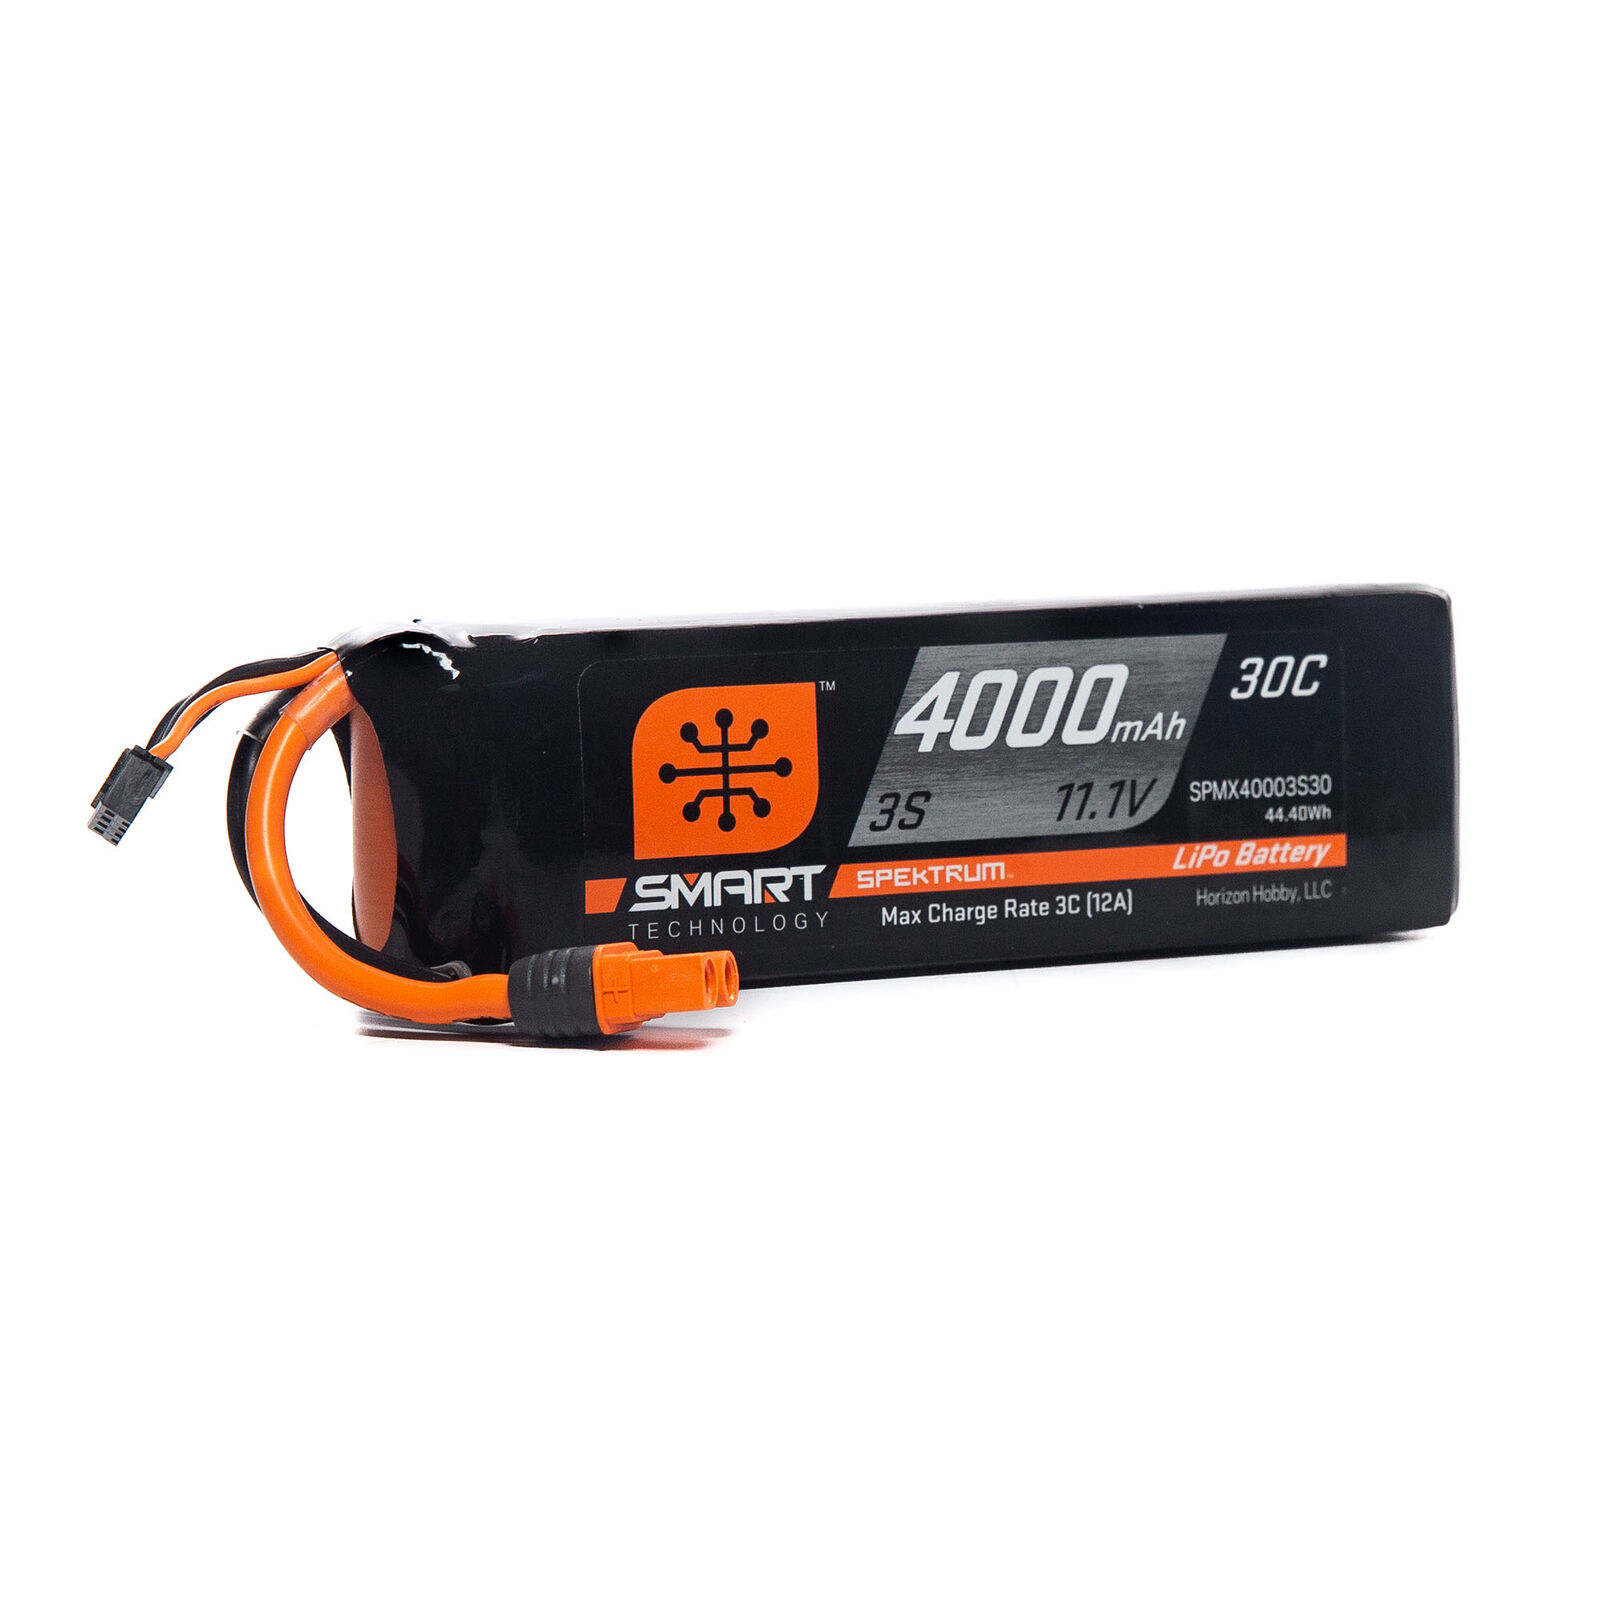 11.1V 4000mAh 3S 30C Smart LiPo Battery: IC3